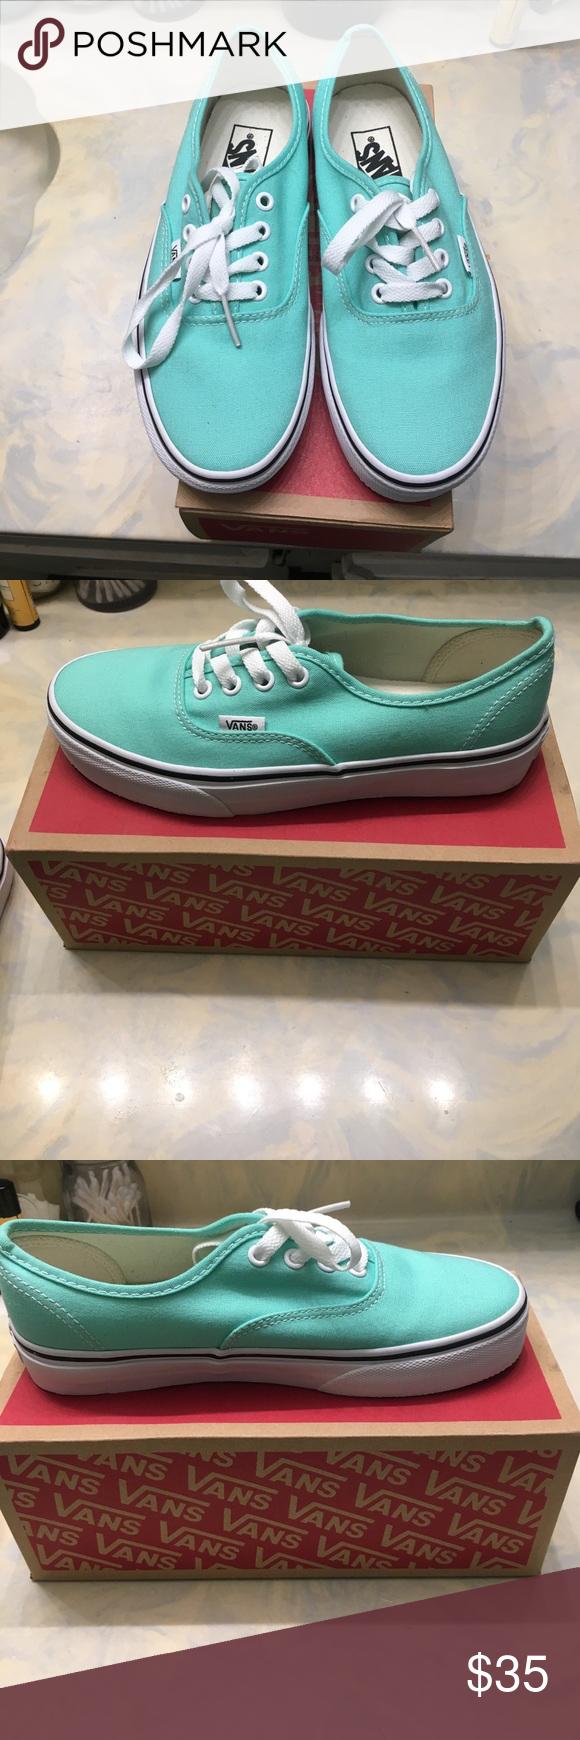 3bf29c9fd5 Vans shoes size 6.5 never worn Vans shoes size 6.5 never worn. Light light  turquoise  sea foam green color. Vans Shoes Sneakers